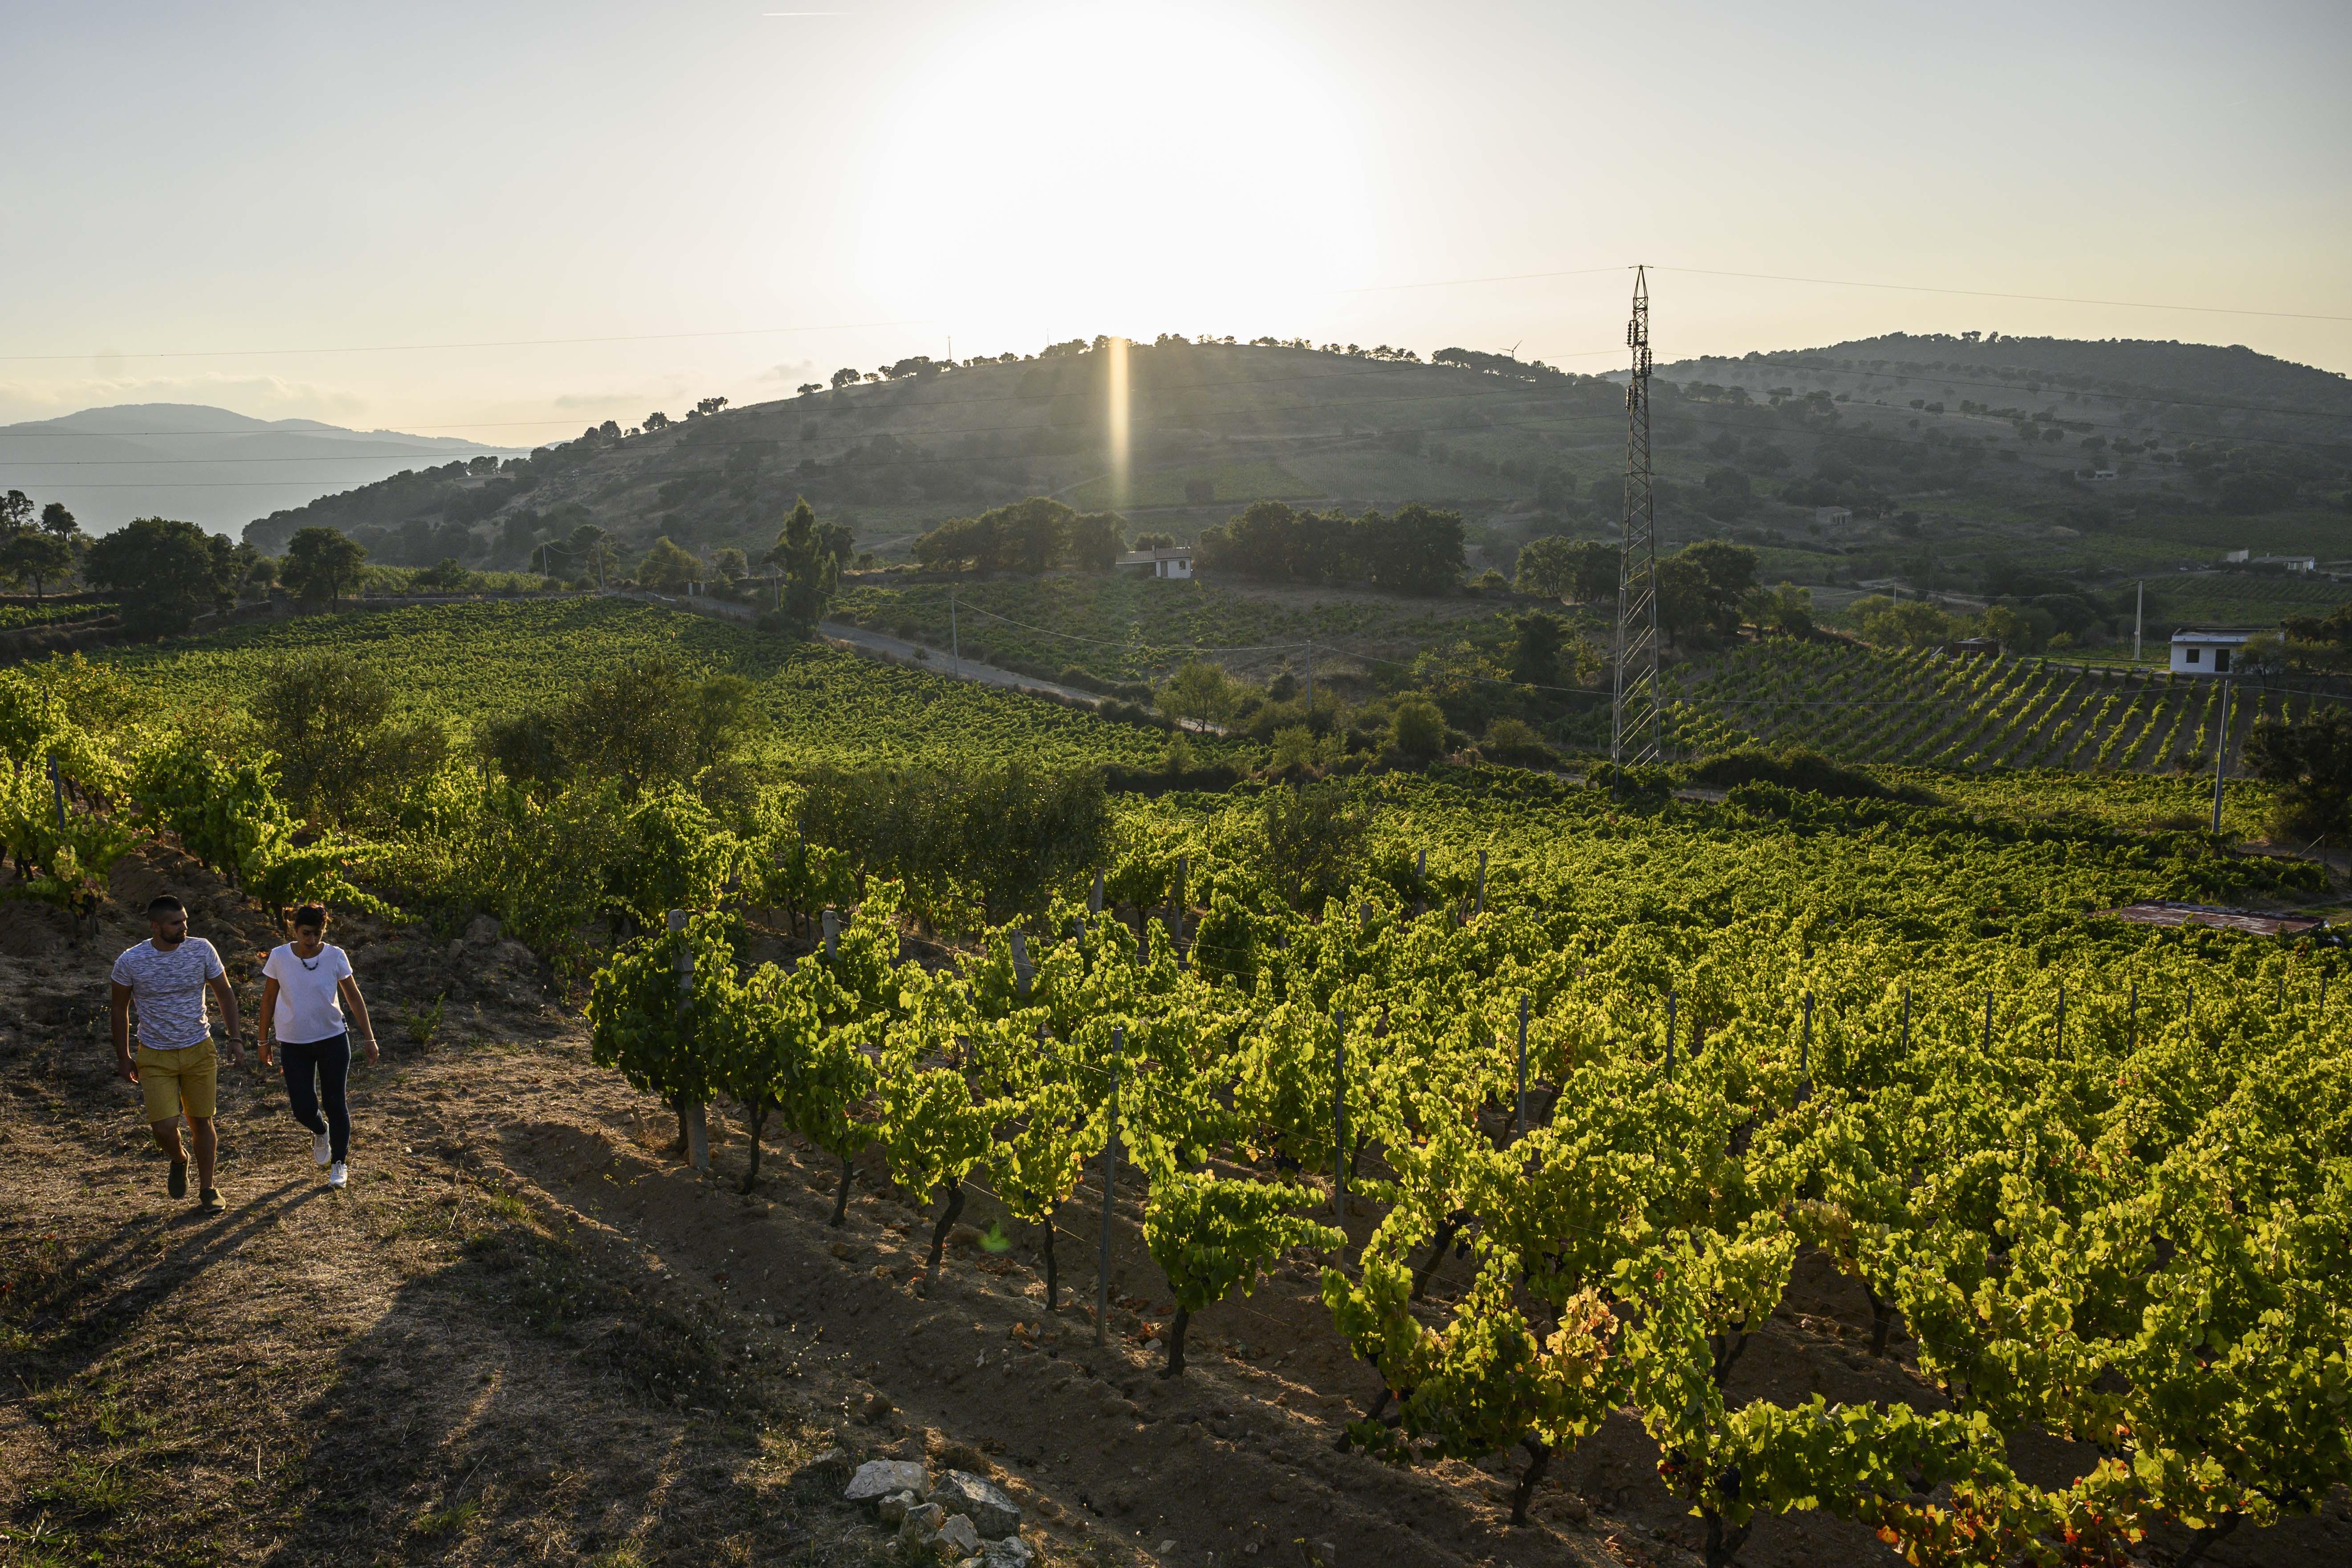 #cantinacanneddu #mamoiada #territorio #terroir #zibbo #delissia #mamò #zibborosè #sardinia #sardegna #mamojà #winefamily #winetaste #winelovers #winestory #redwine #whitewine #loacwines #organic #bio